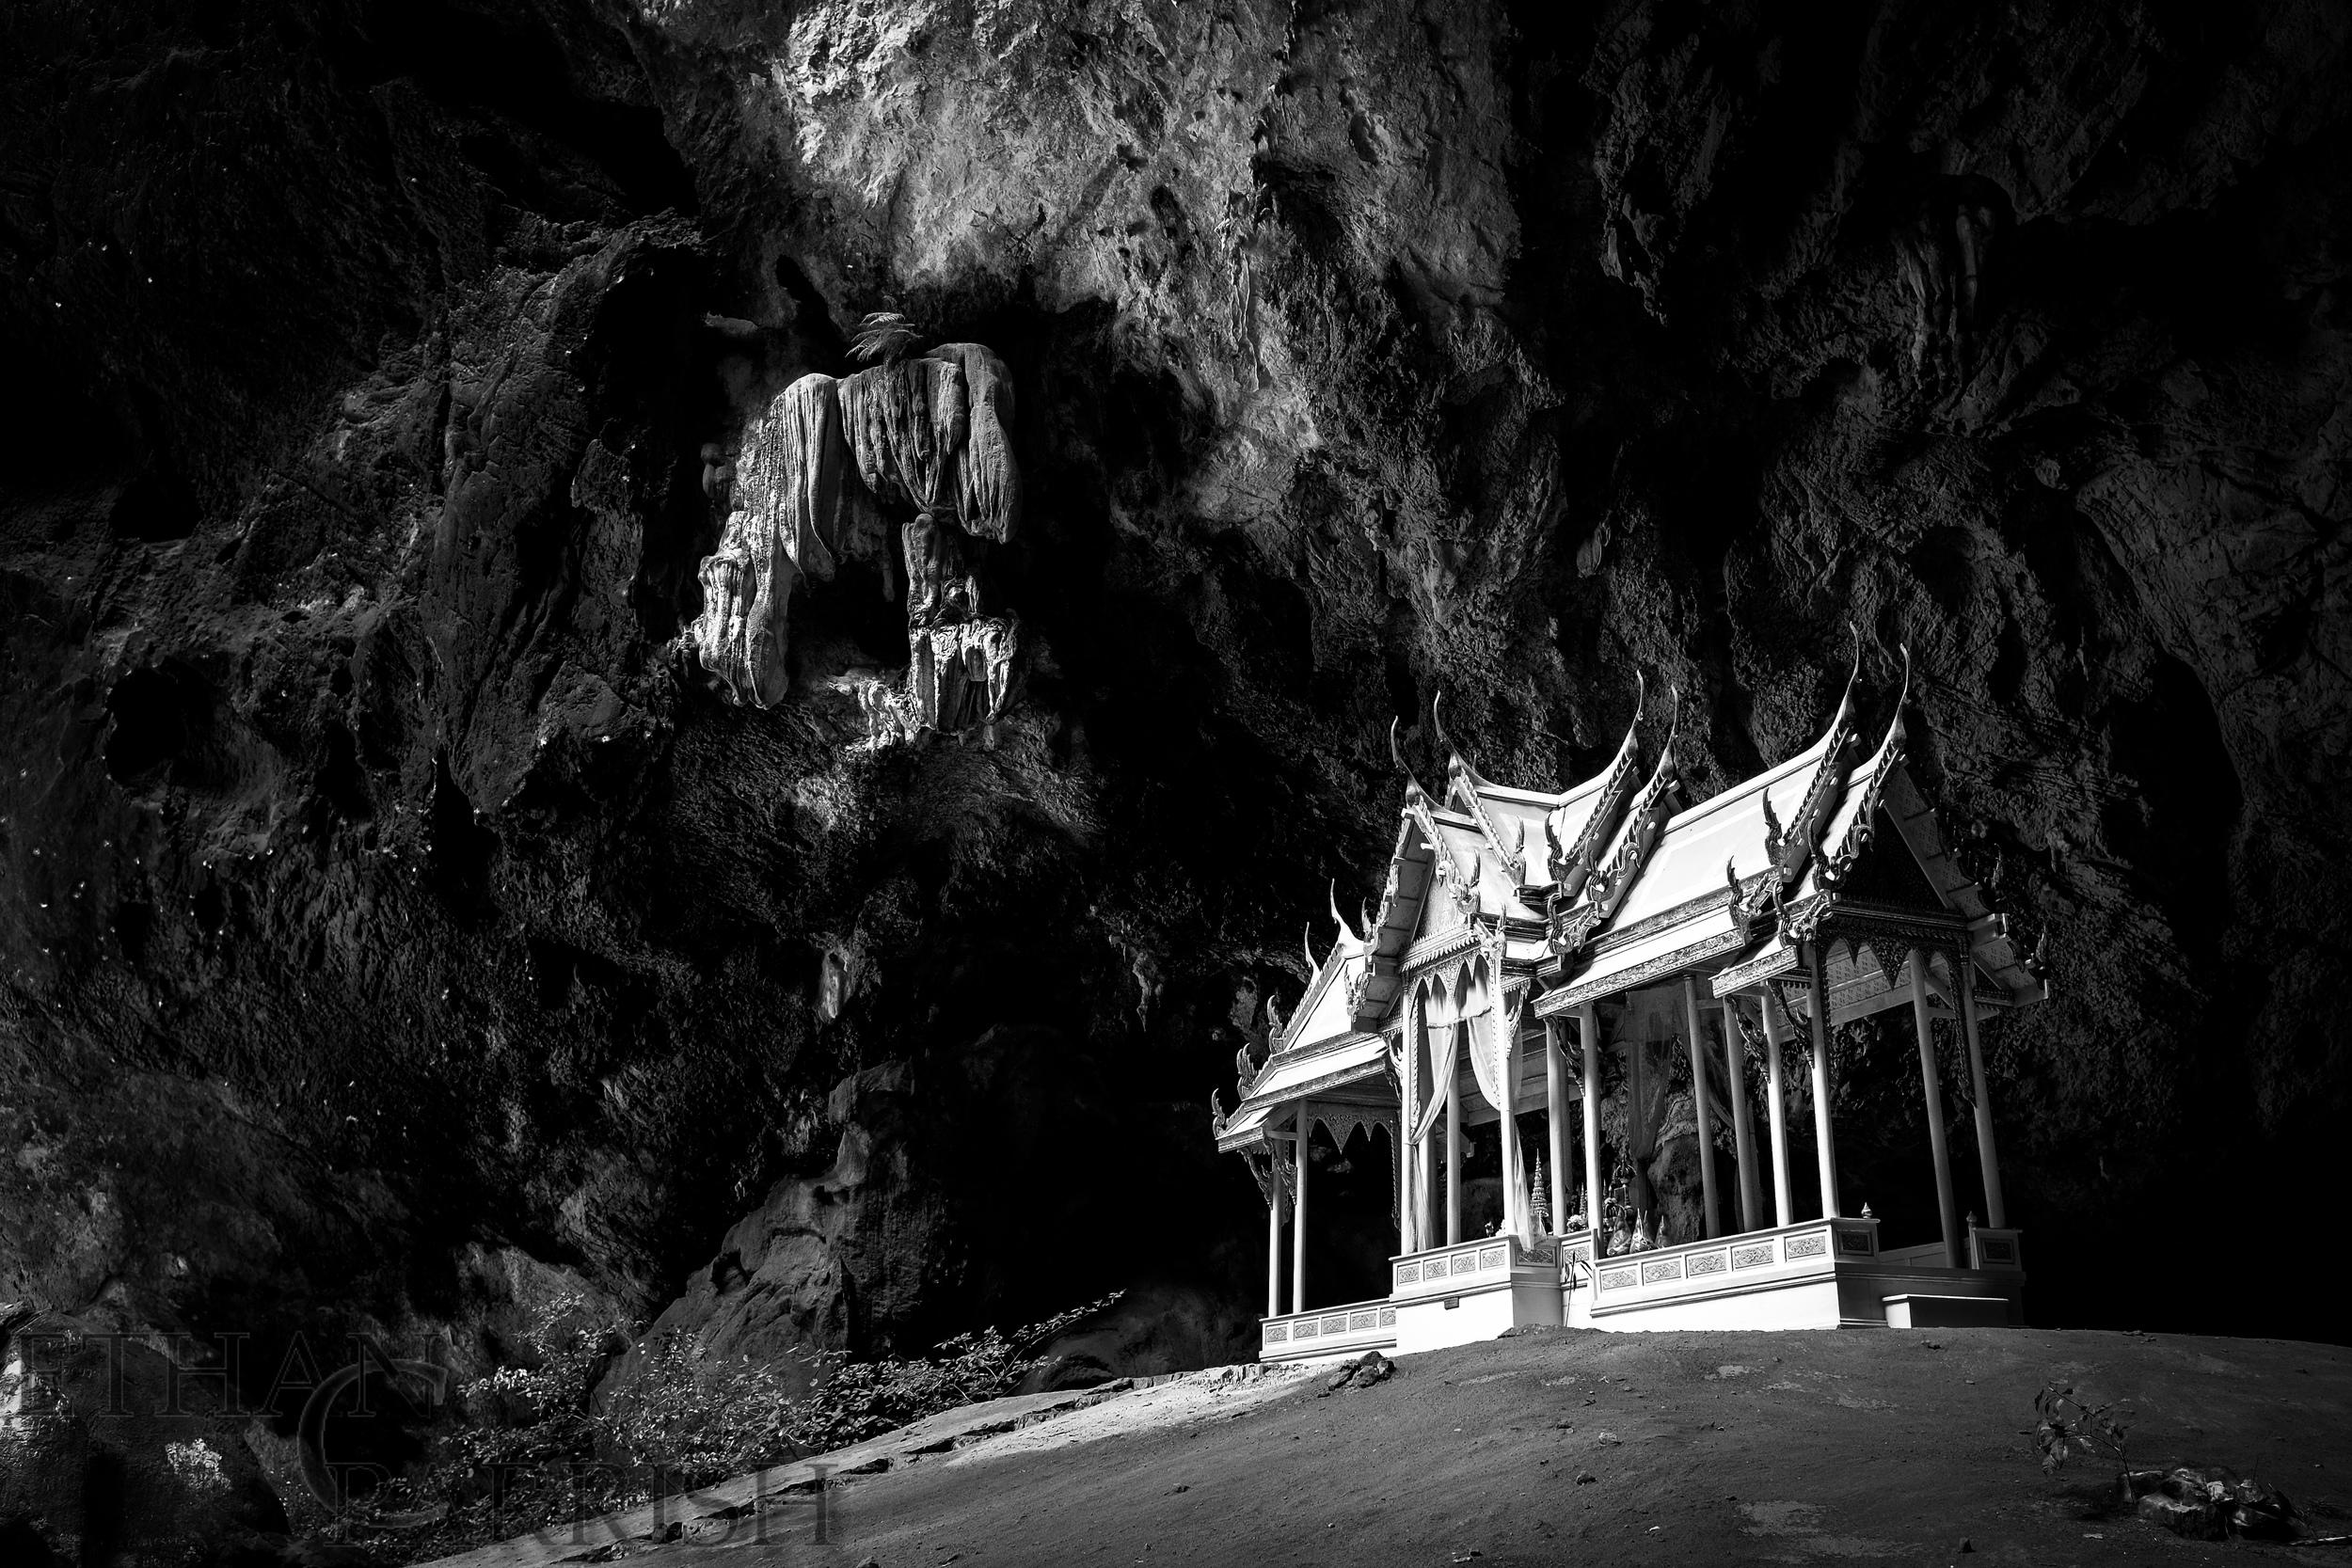 Temple in Phraya Nakhon Cave in Khao Sam Roi Yot National Park, Thailand